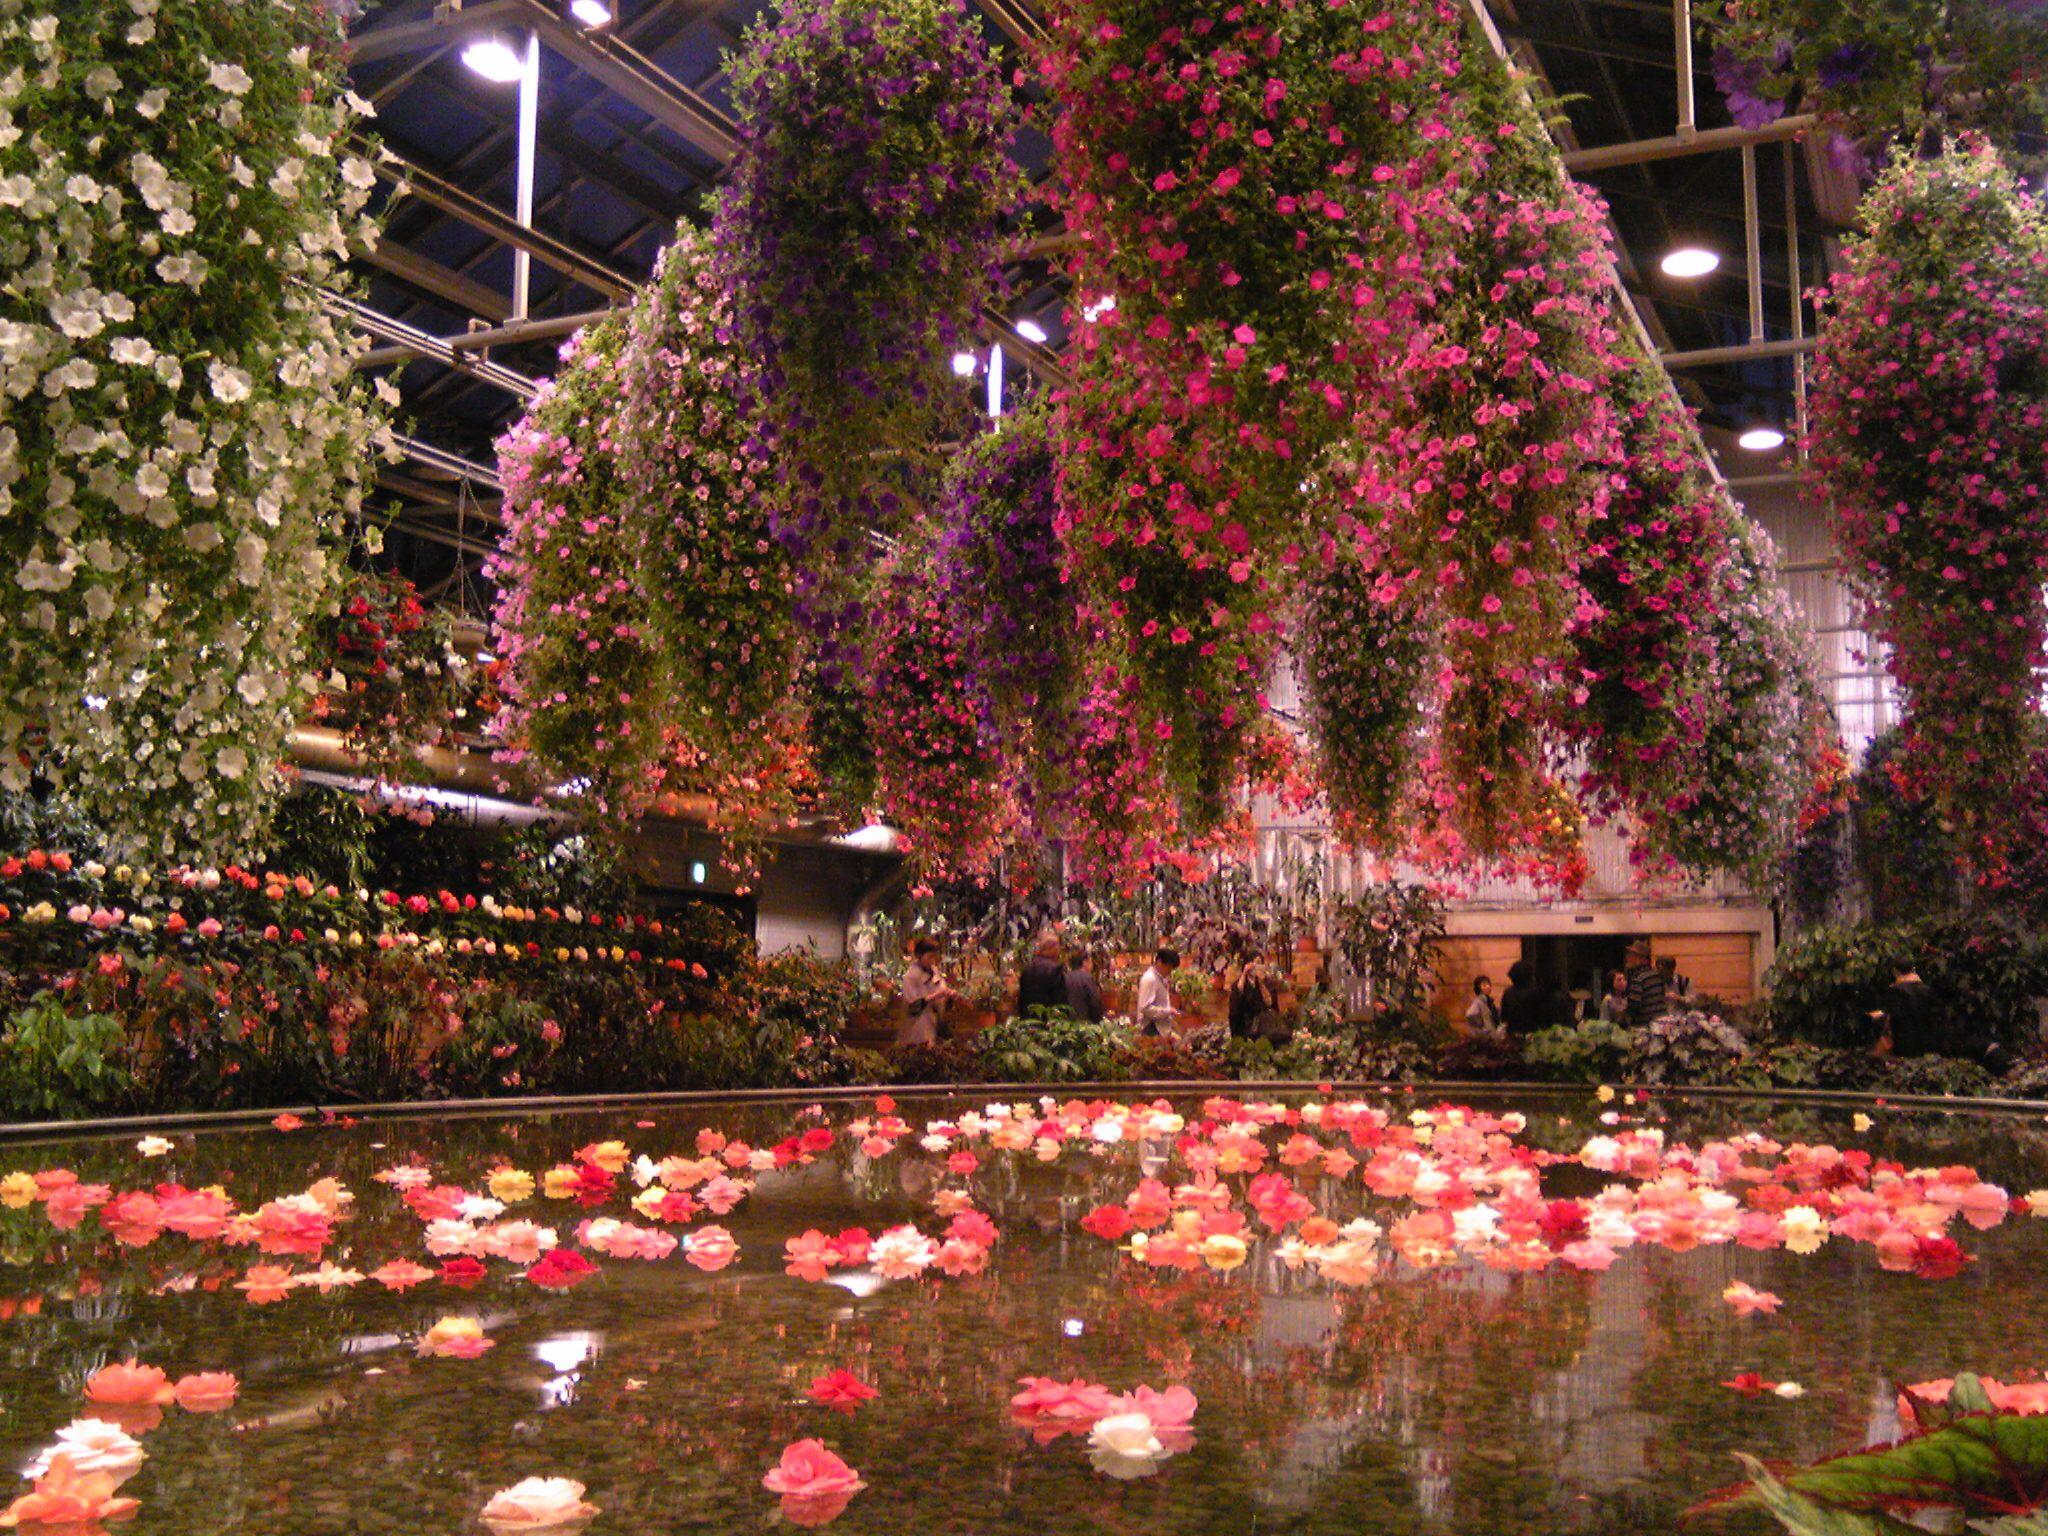 Begonia Garden Nabana No Sato Mie Prefecture Japan Begonia